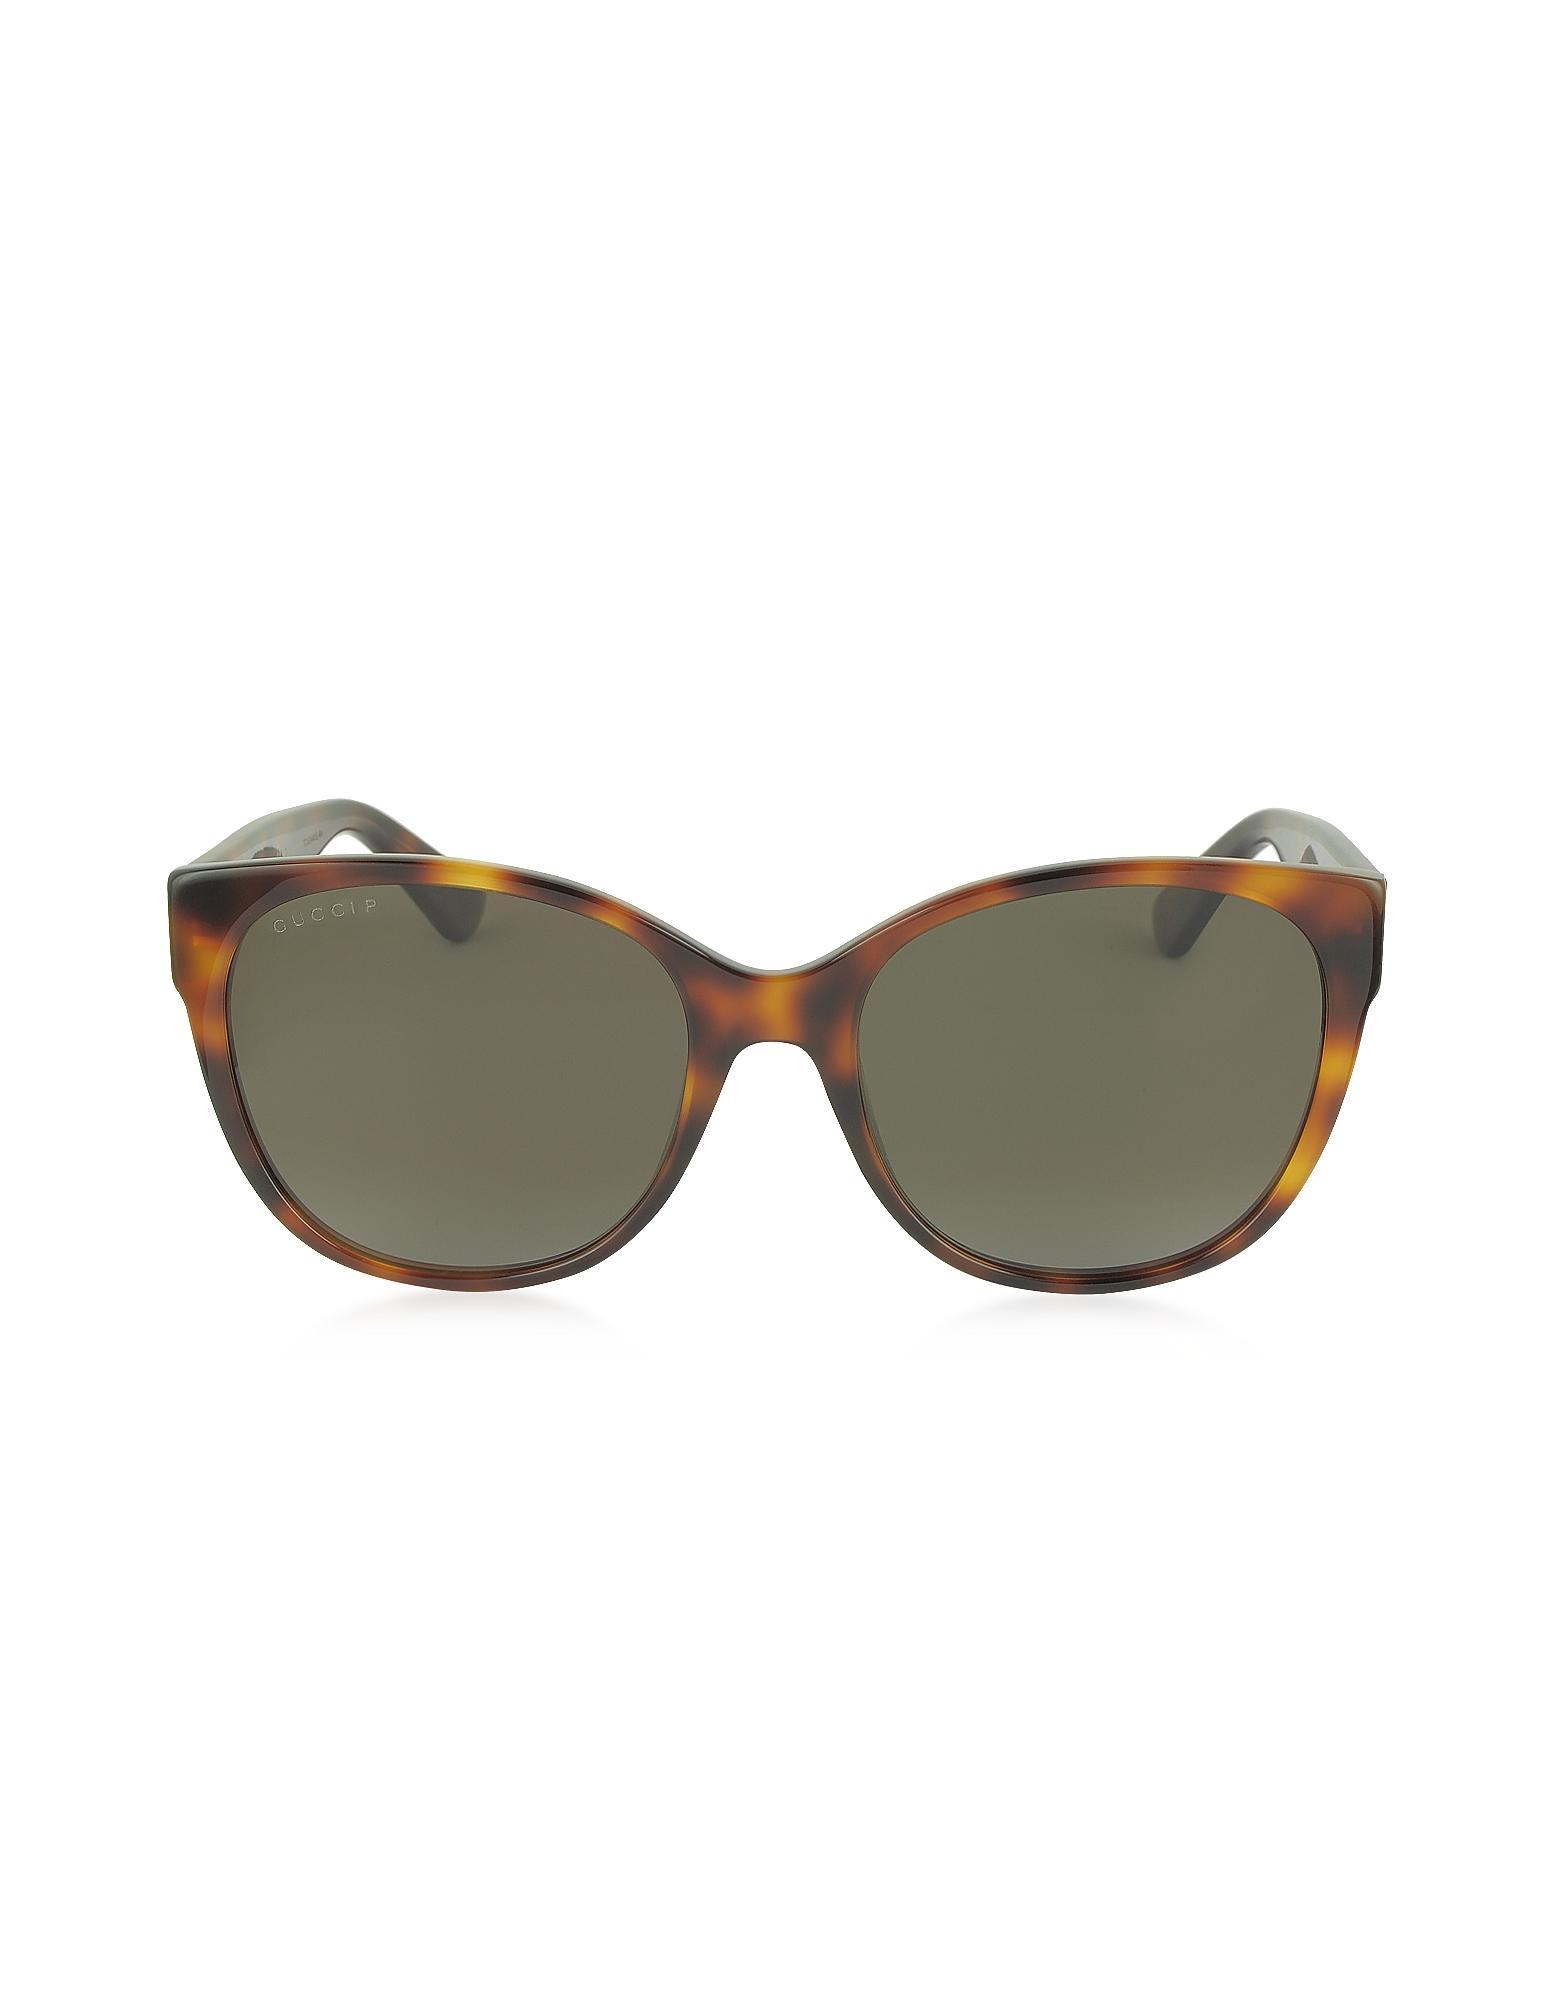 37ccc973747a9e Gucci. Yellow GG0097S 006 Havana Acetate Cat Eye Women s Polarized  Sunglasses